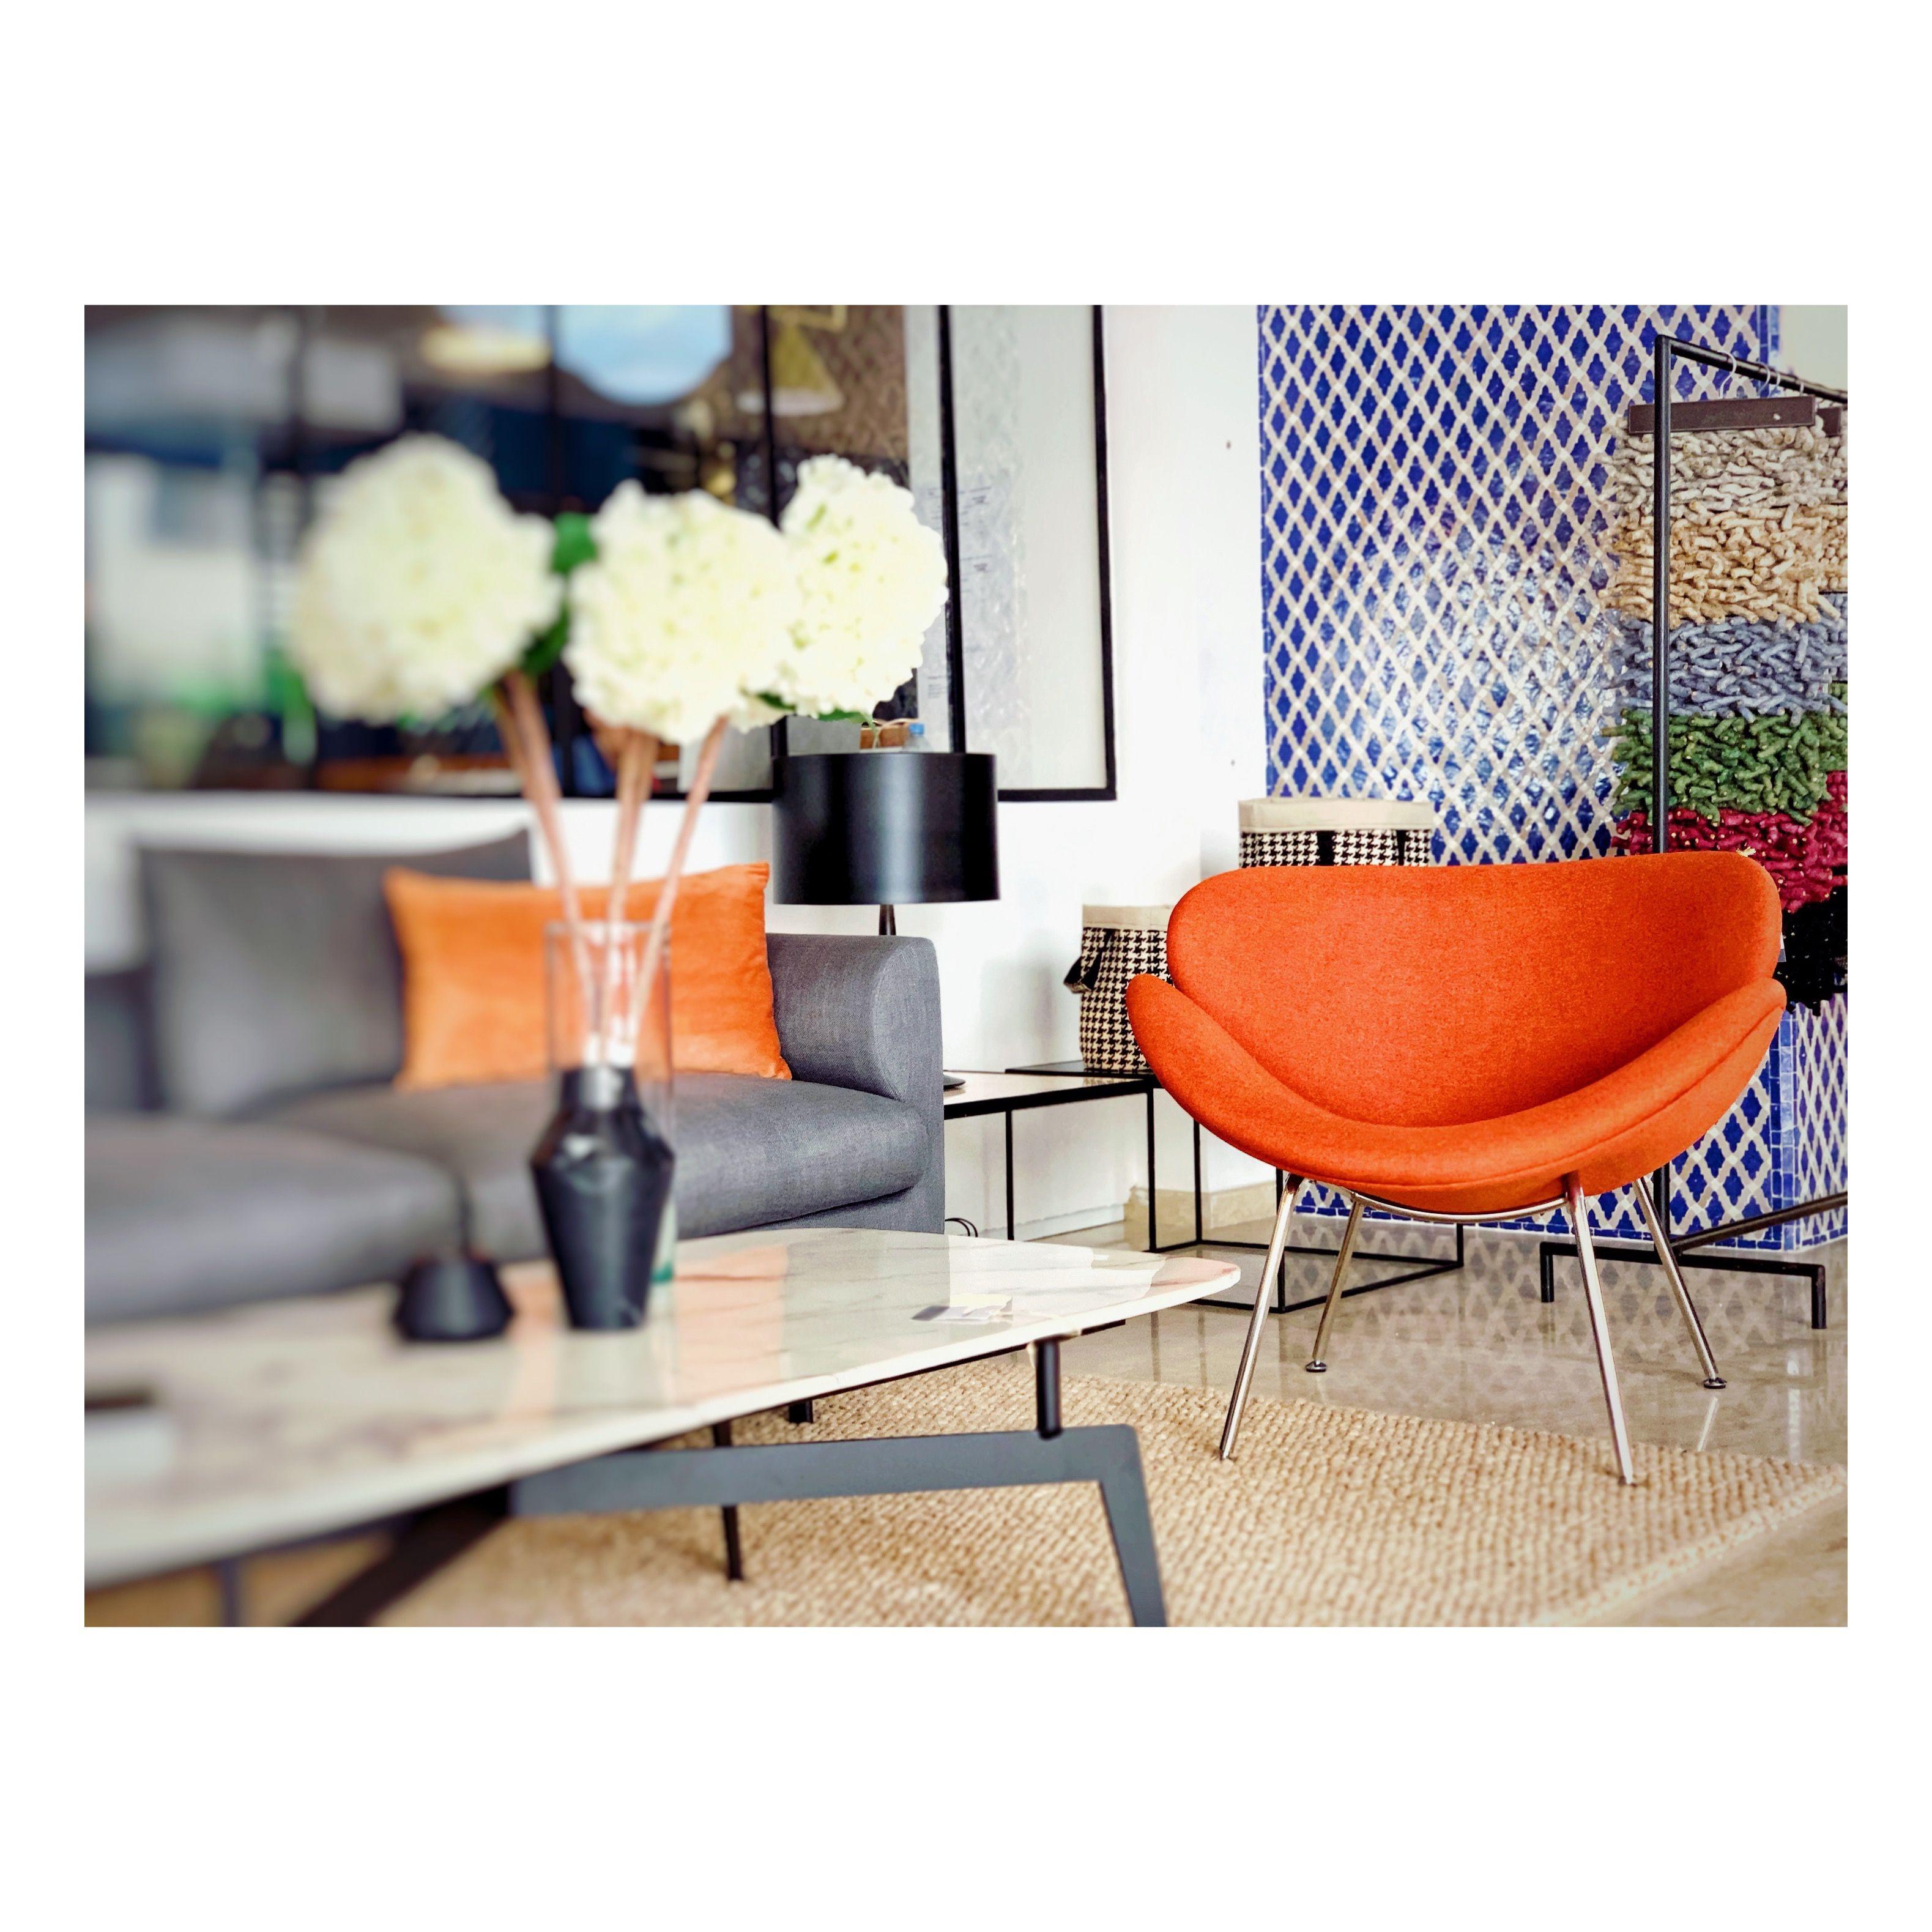 Retroplus Casablanca Orange Slice Inspirztion Meuble Design Mobilier De Salon Design